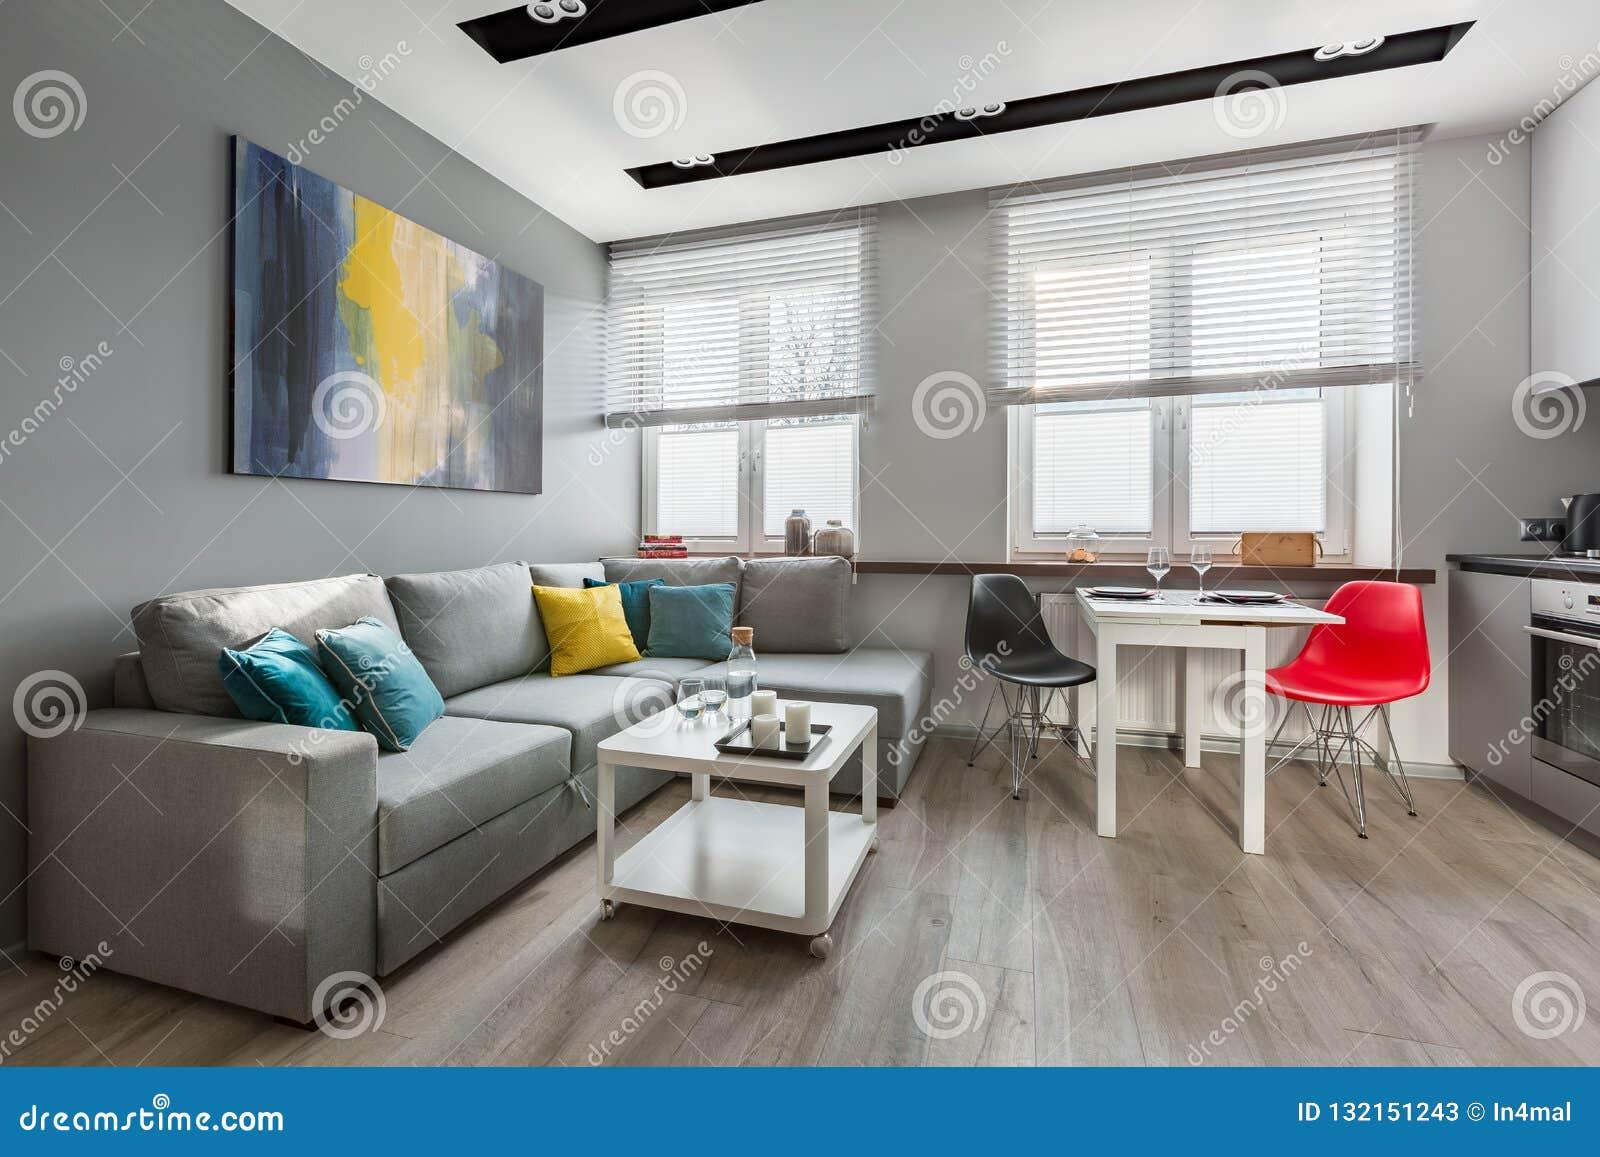 Apartamento-estudio moderno en gris